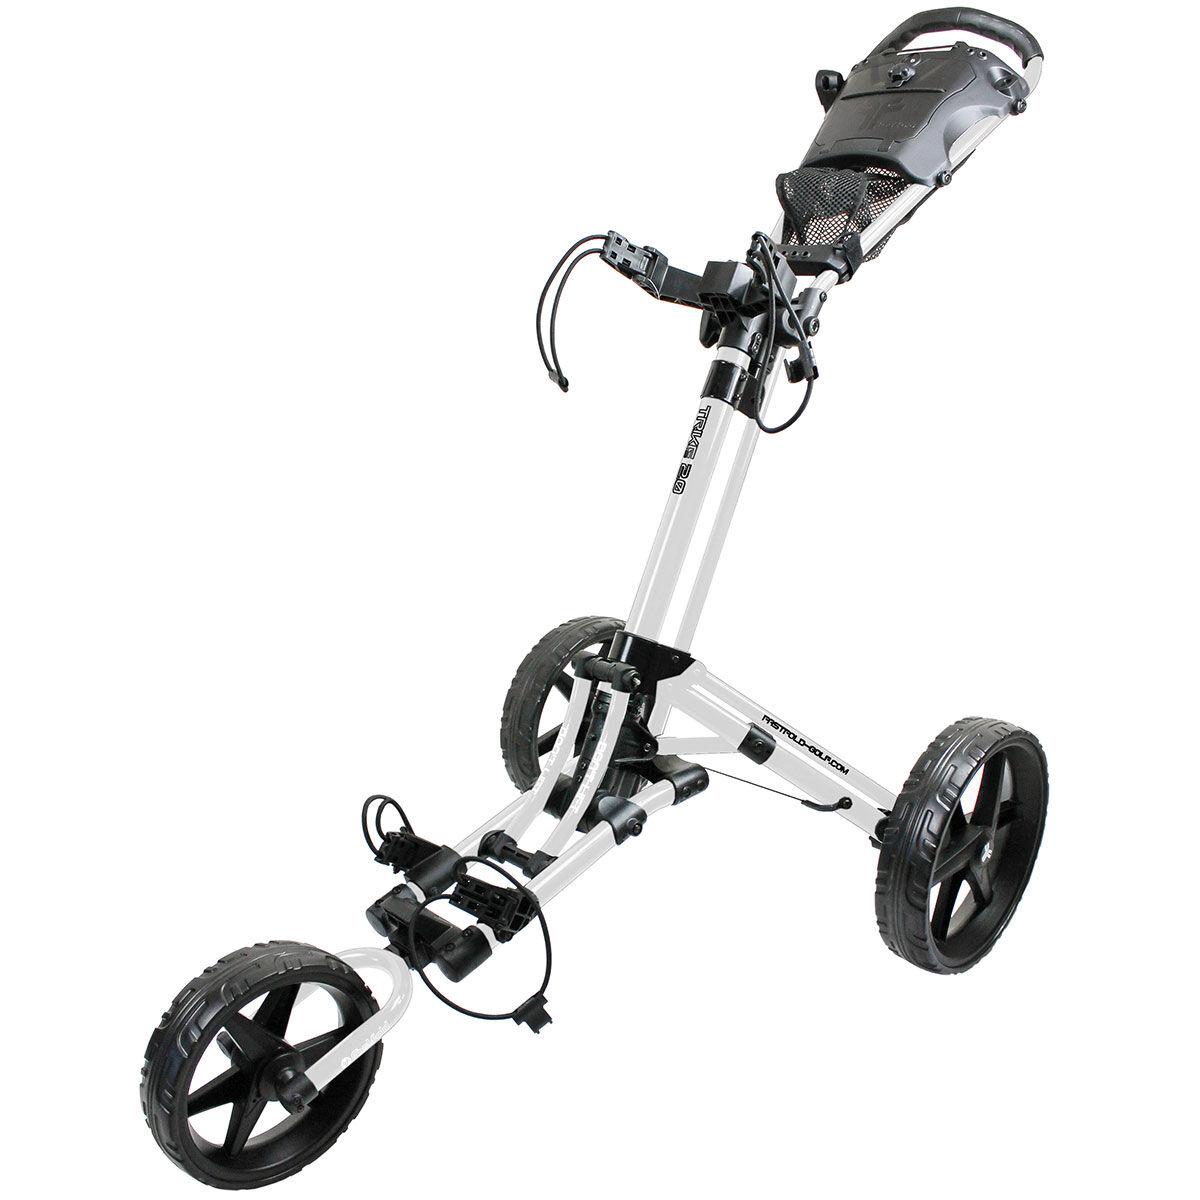 Fast Fold Mens White and Black Lightweight FastFold Trike 2.0 Golf Trolley, Size: 78x42x40cm | American Golf | American Golf